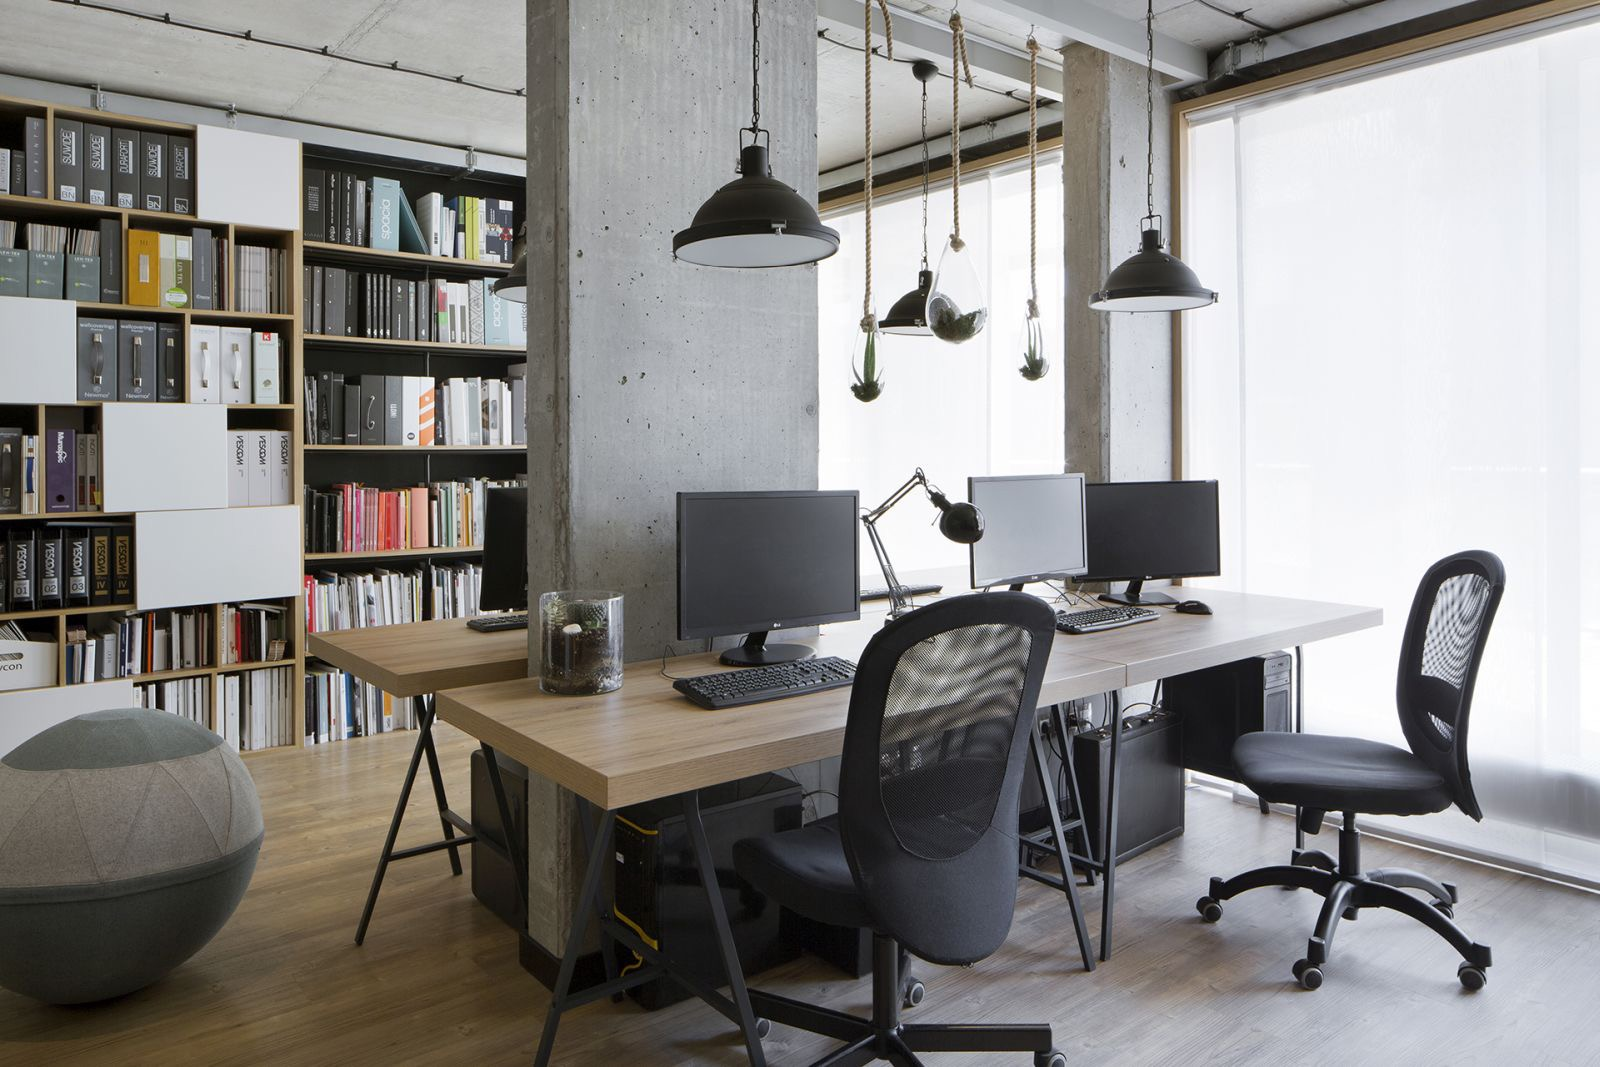 tremend-office-warsaw-6